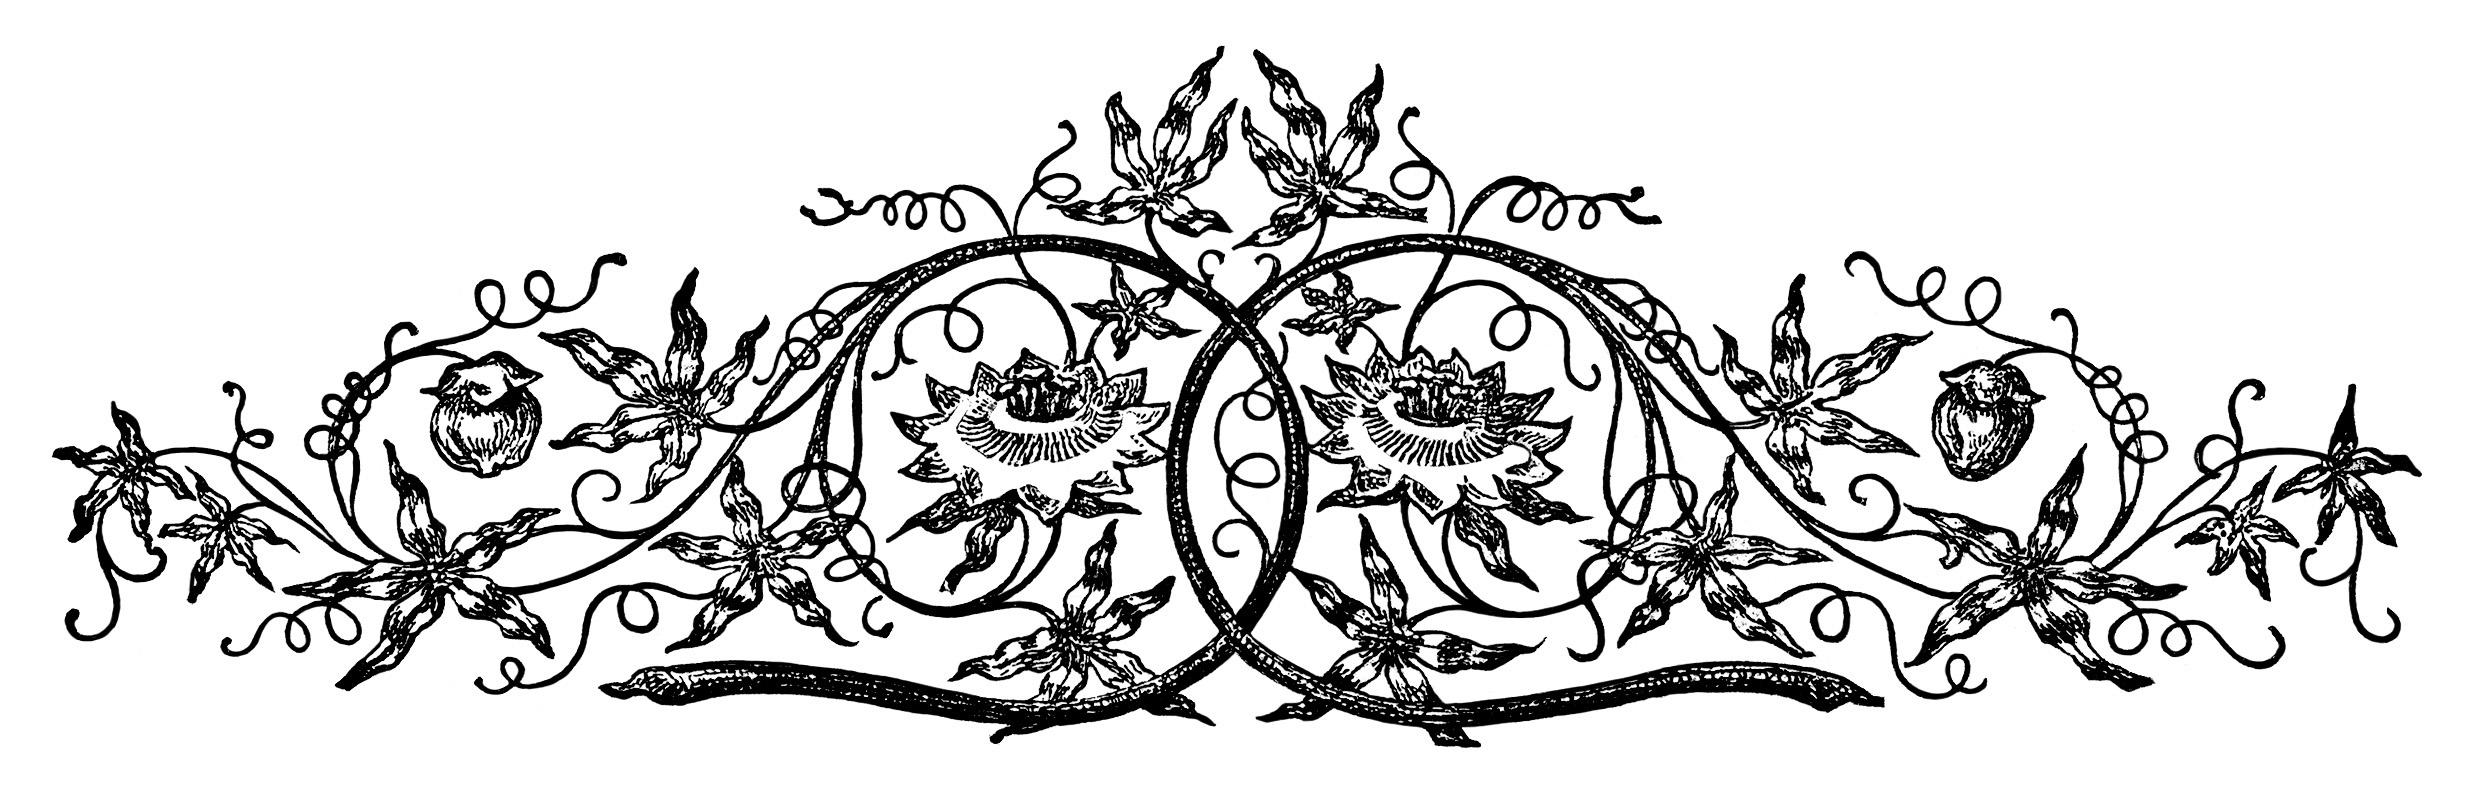 12 Fancy Swirl Design Images